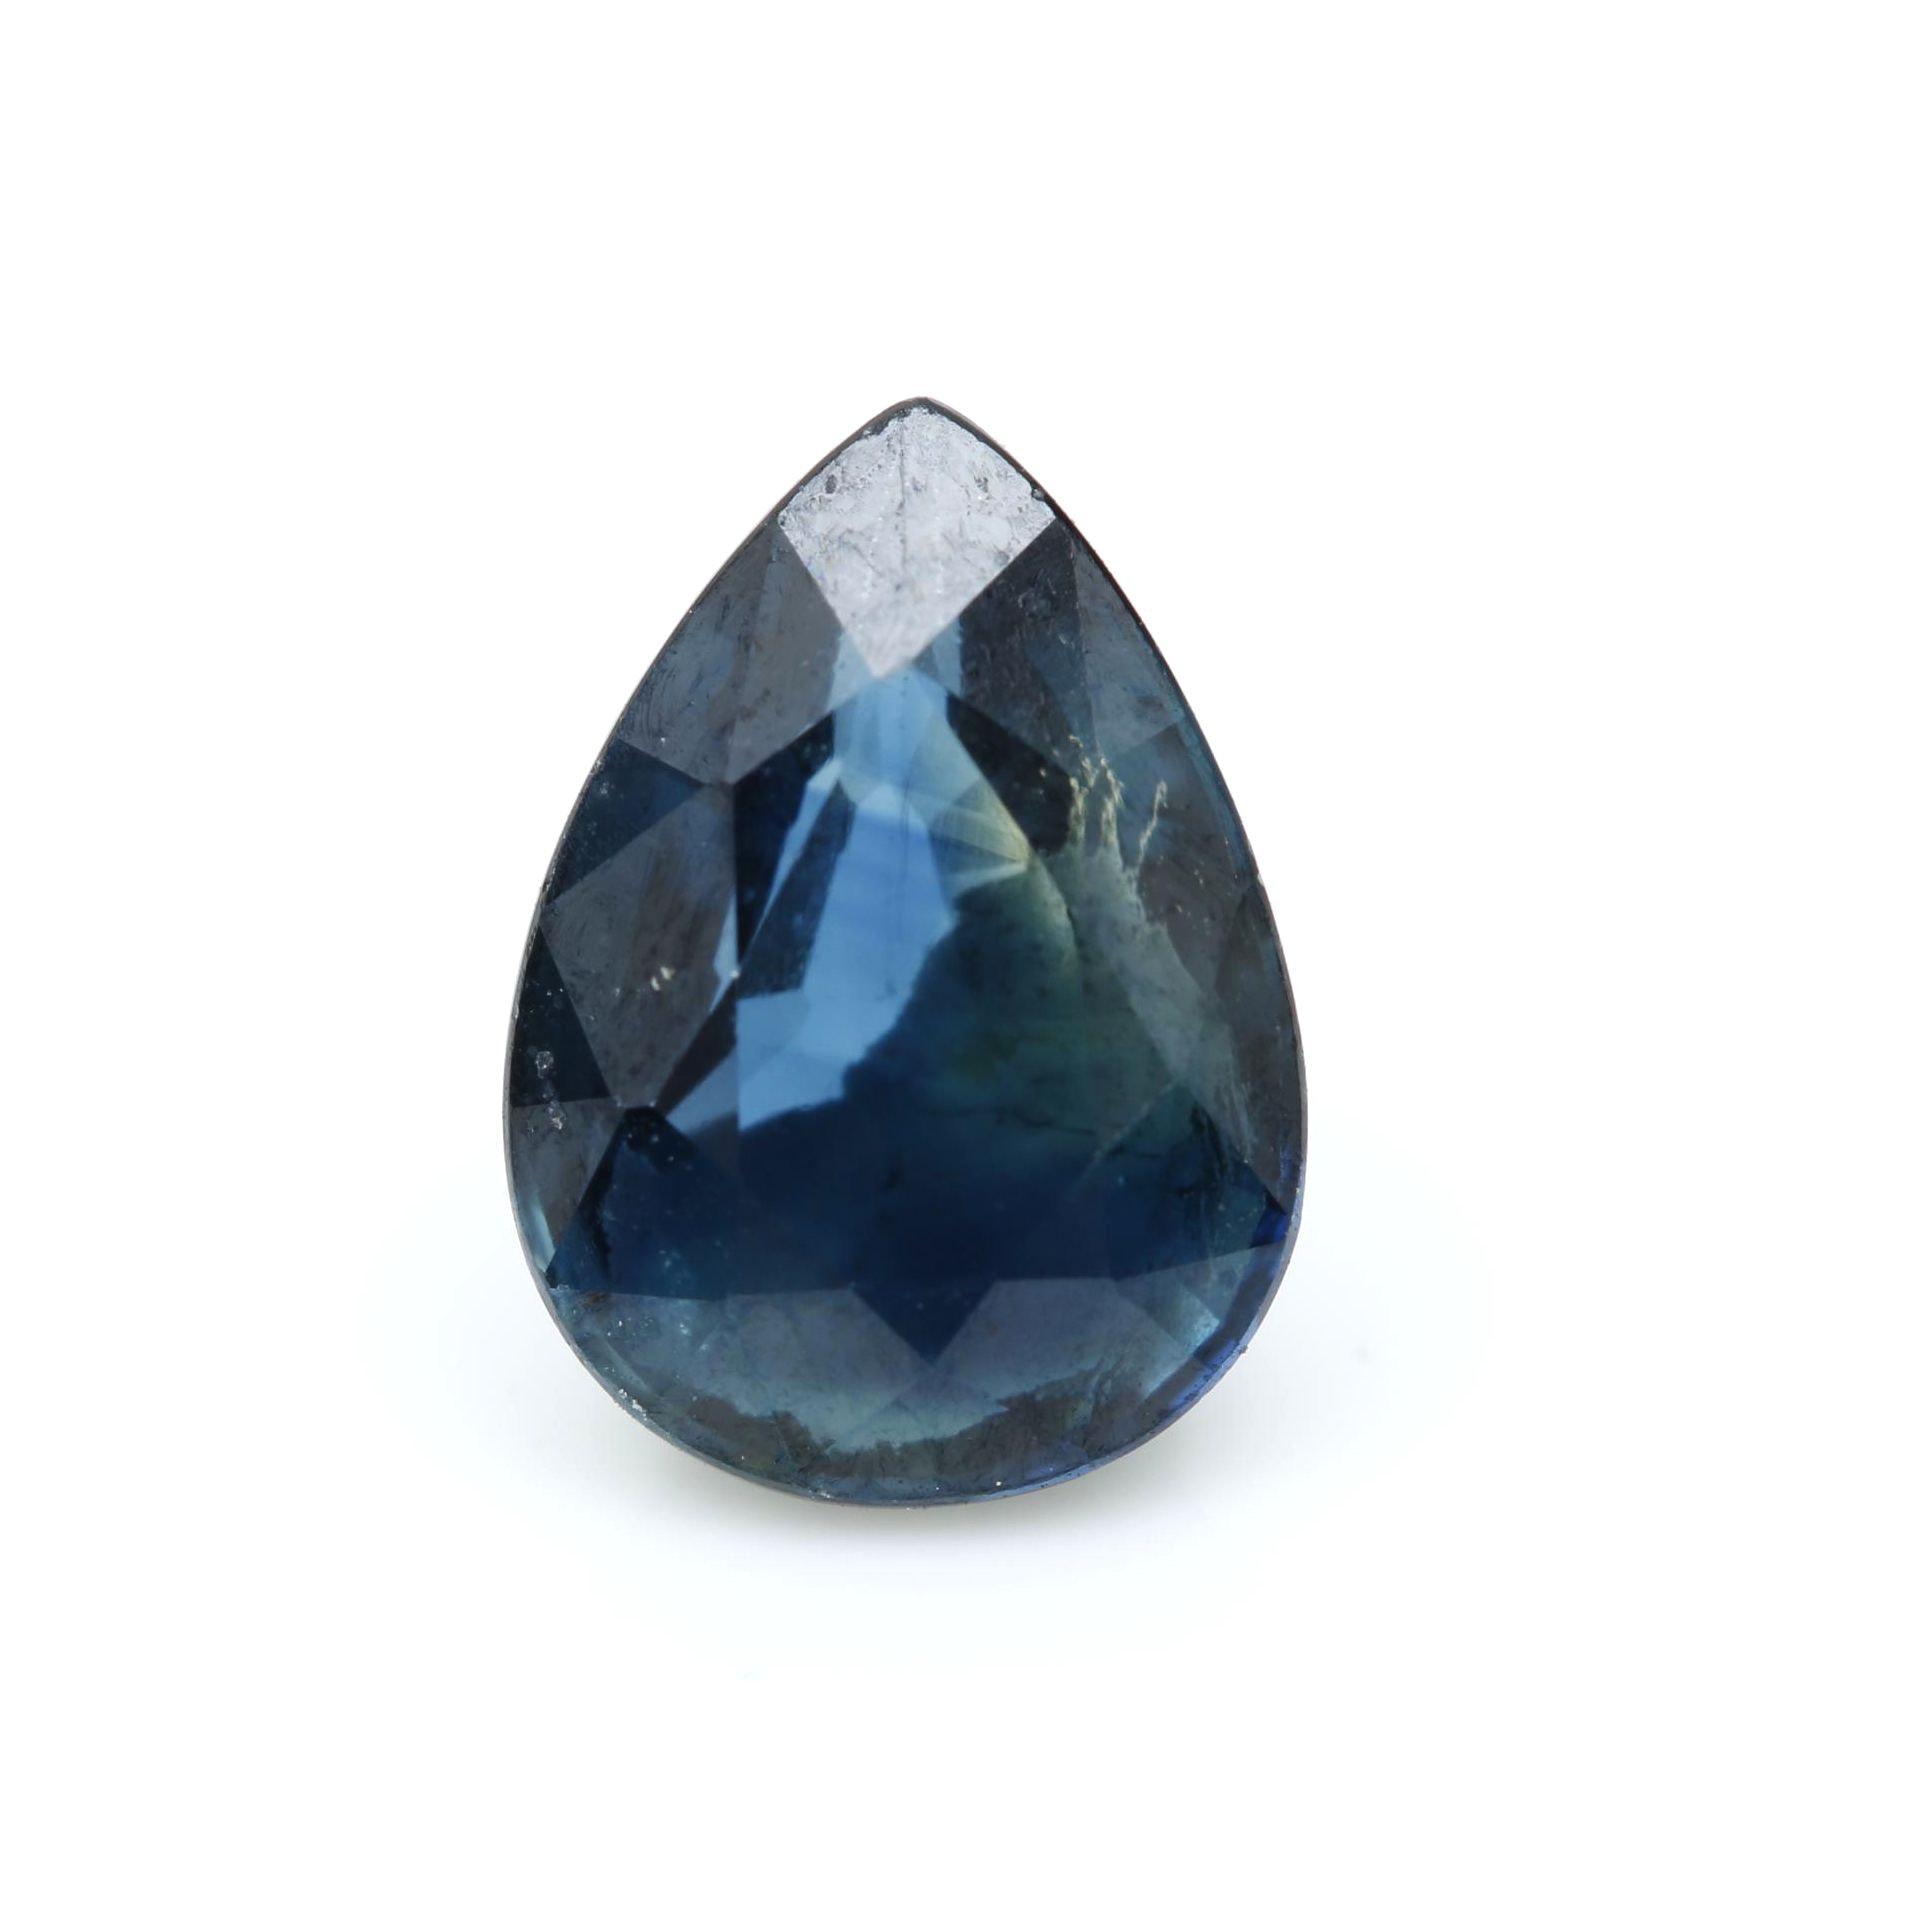 Loose 1.04 CT Sapphire Gemstone